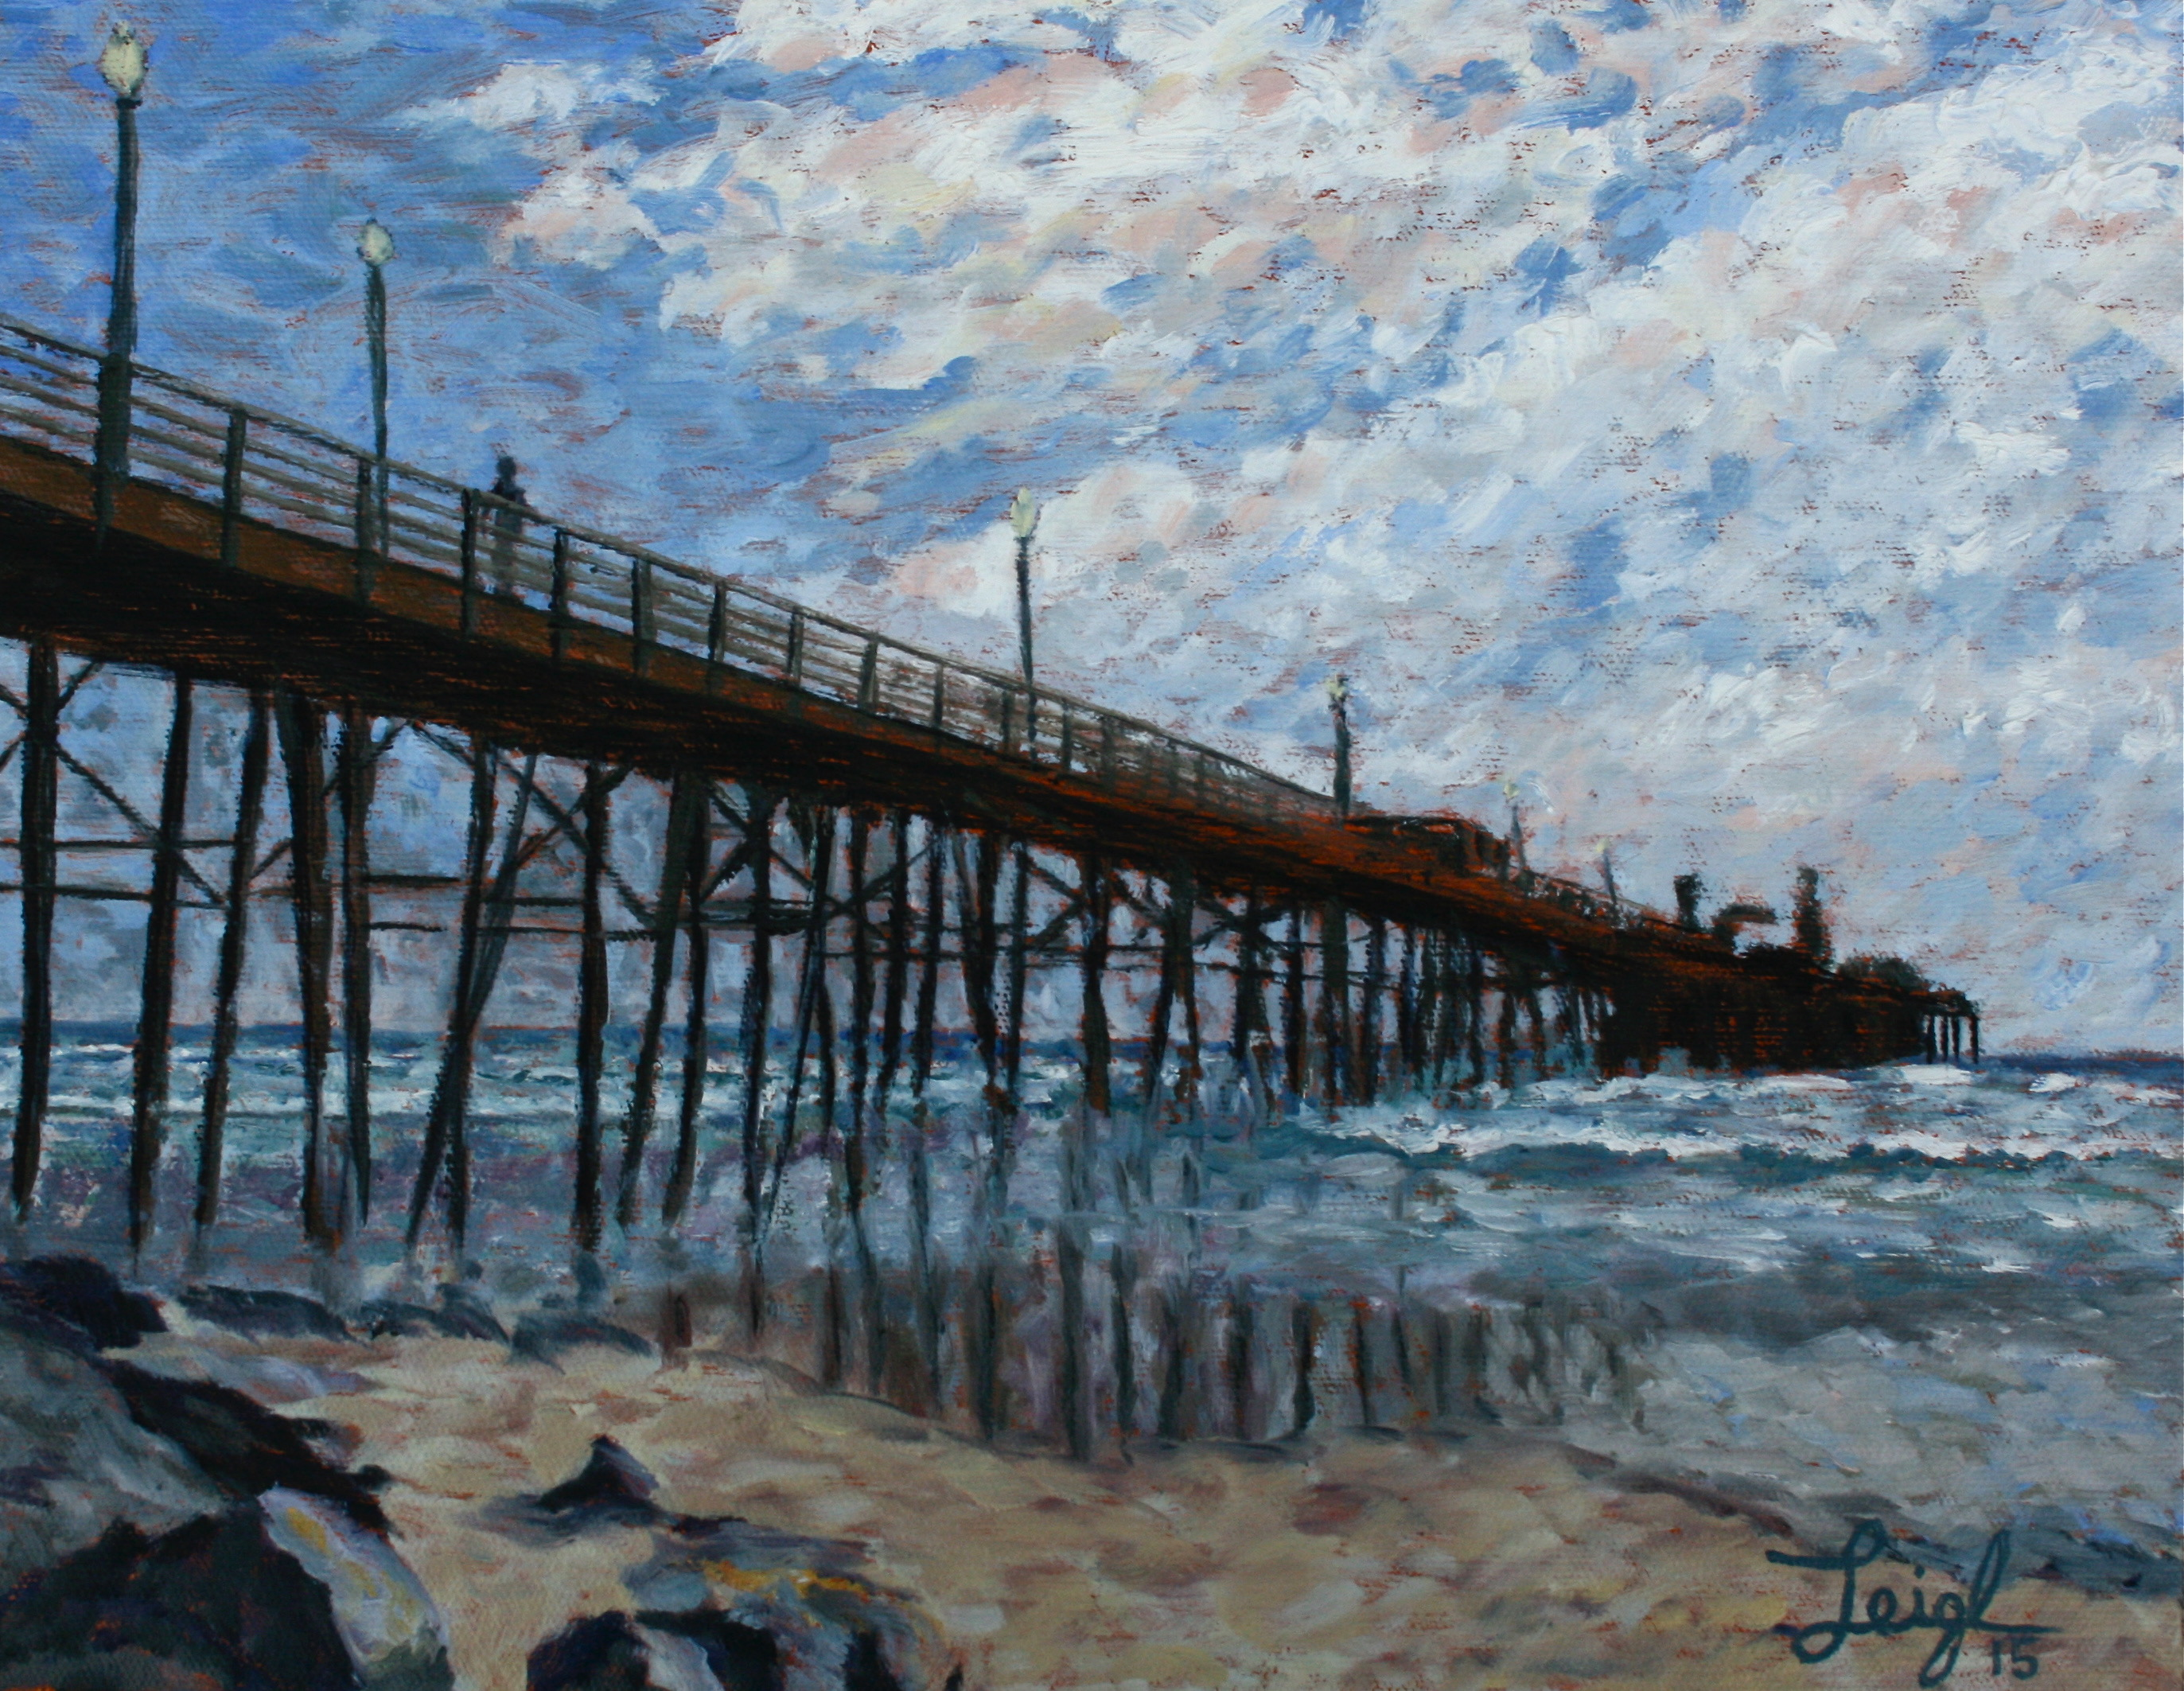 Oceanside Pier 2015  ~   Mark Jacobson, Santa Rosa, CA  2015 • 14 x 11